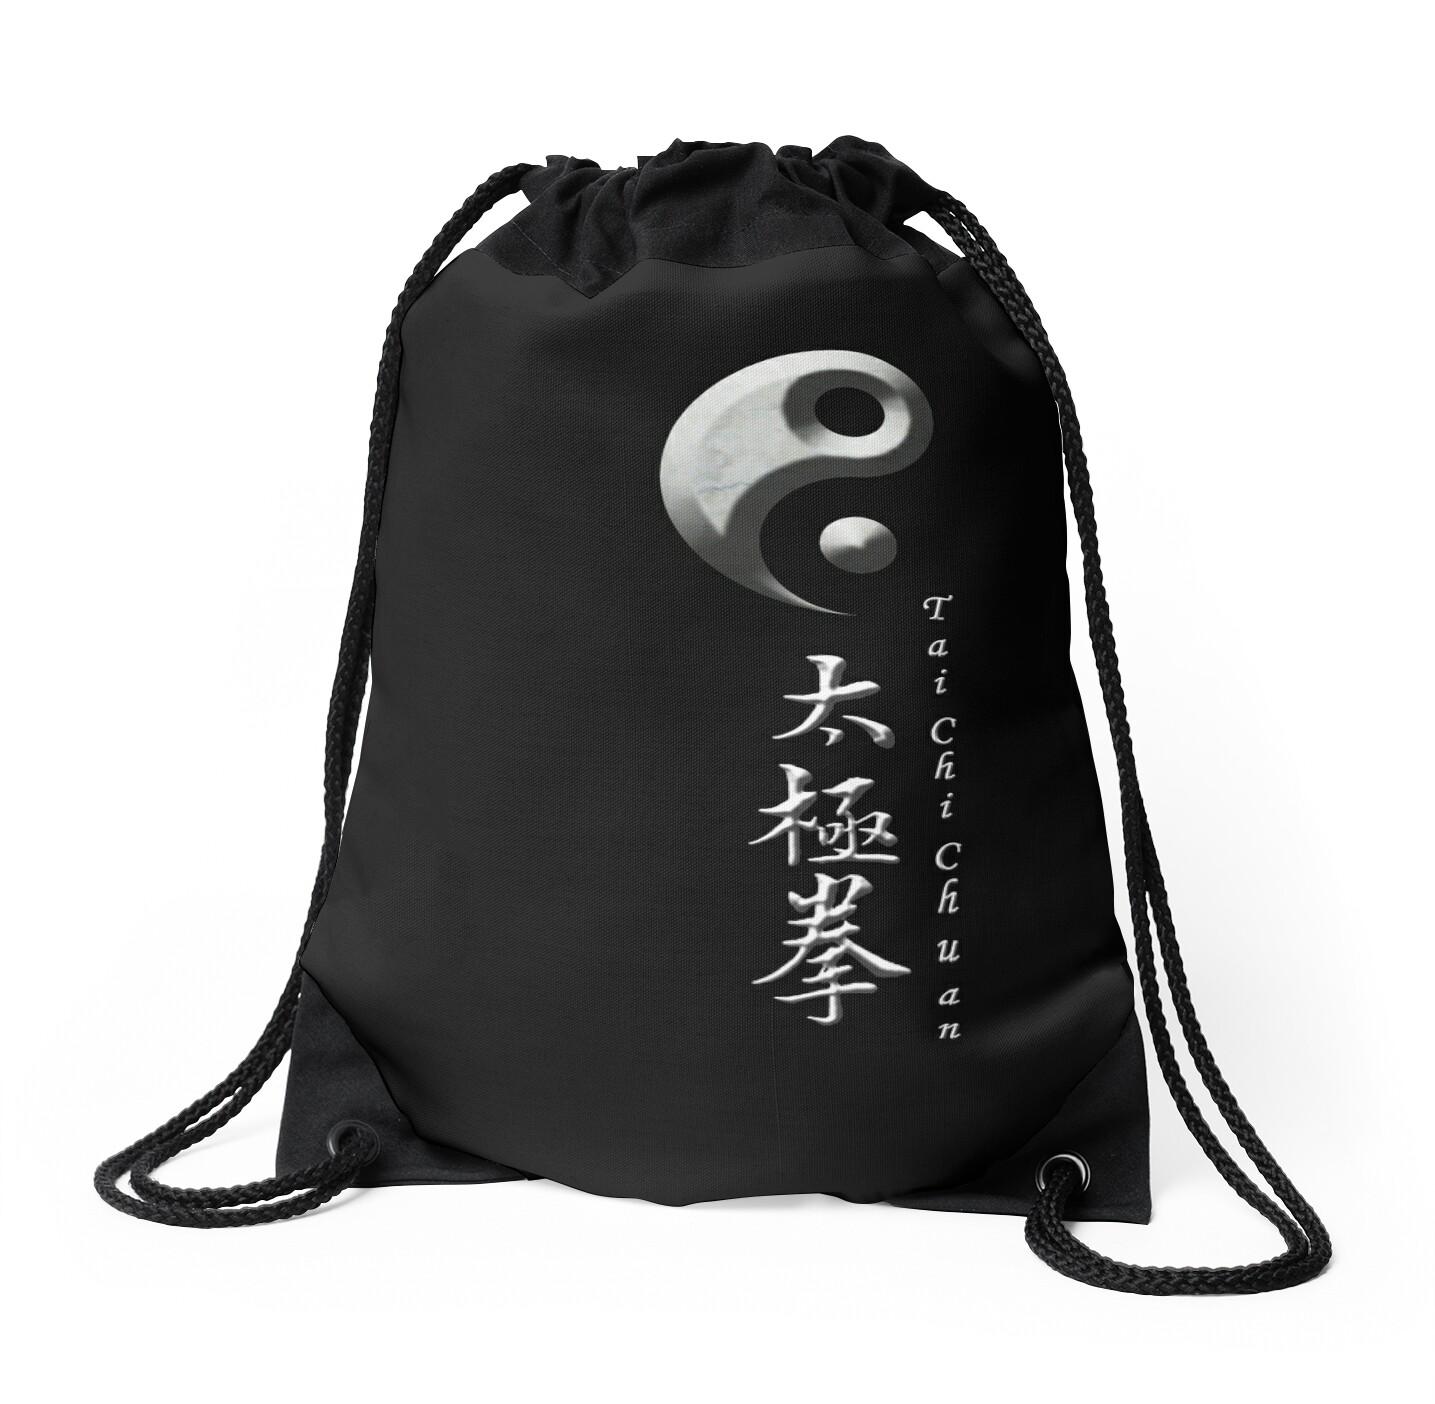 Yin yang symbol for tai chi chuan drawstring bags by gary yin yang symbol for tai chi chuan by gary matthews biocorpaavc Gallery